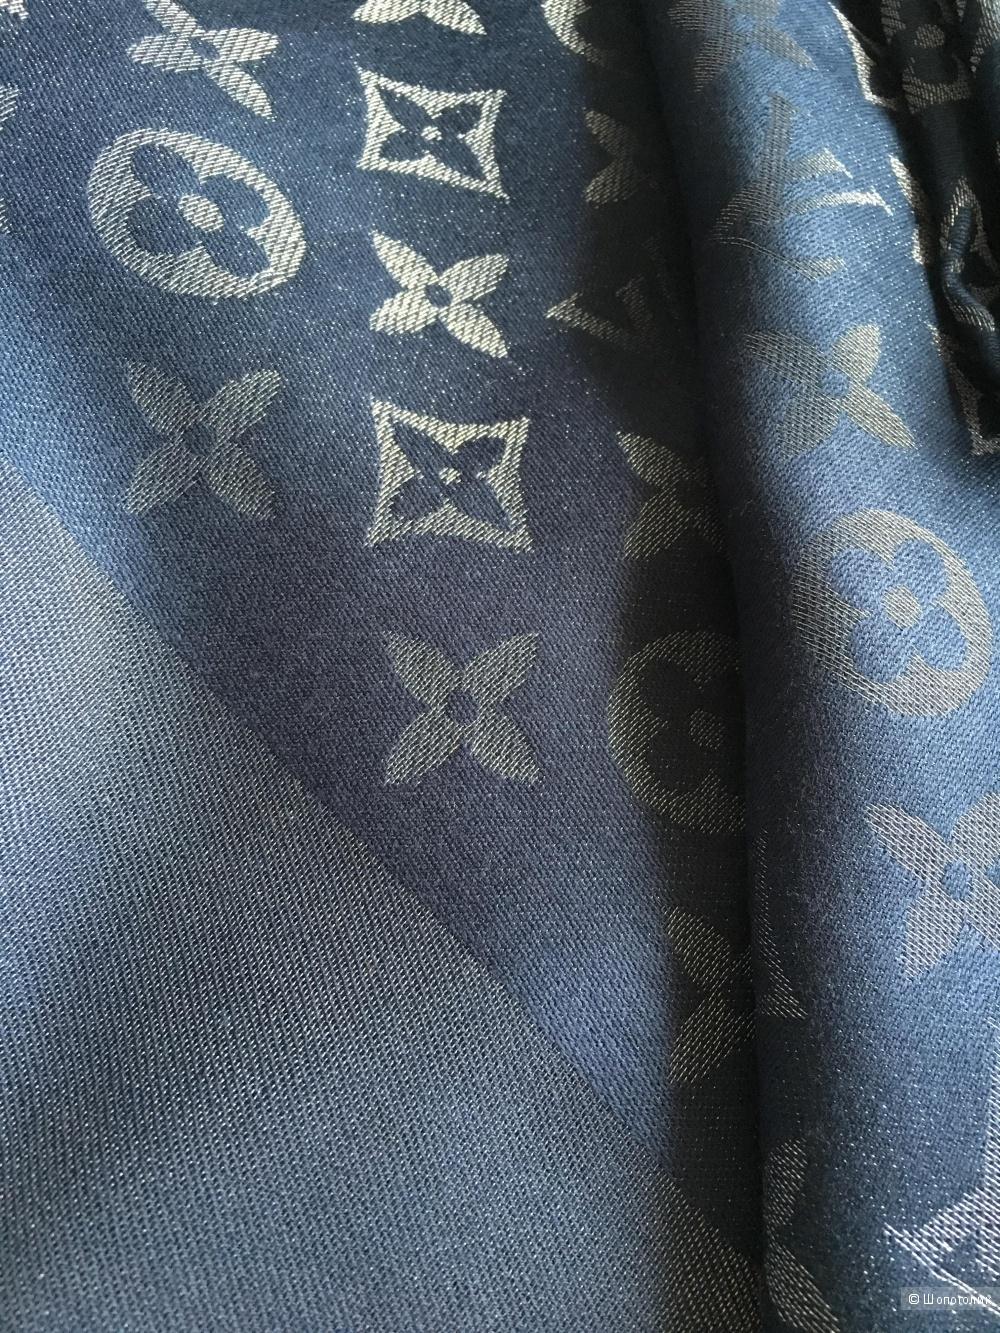 Шаль-платок луи виттон, реплика 140/140